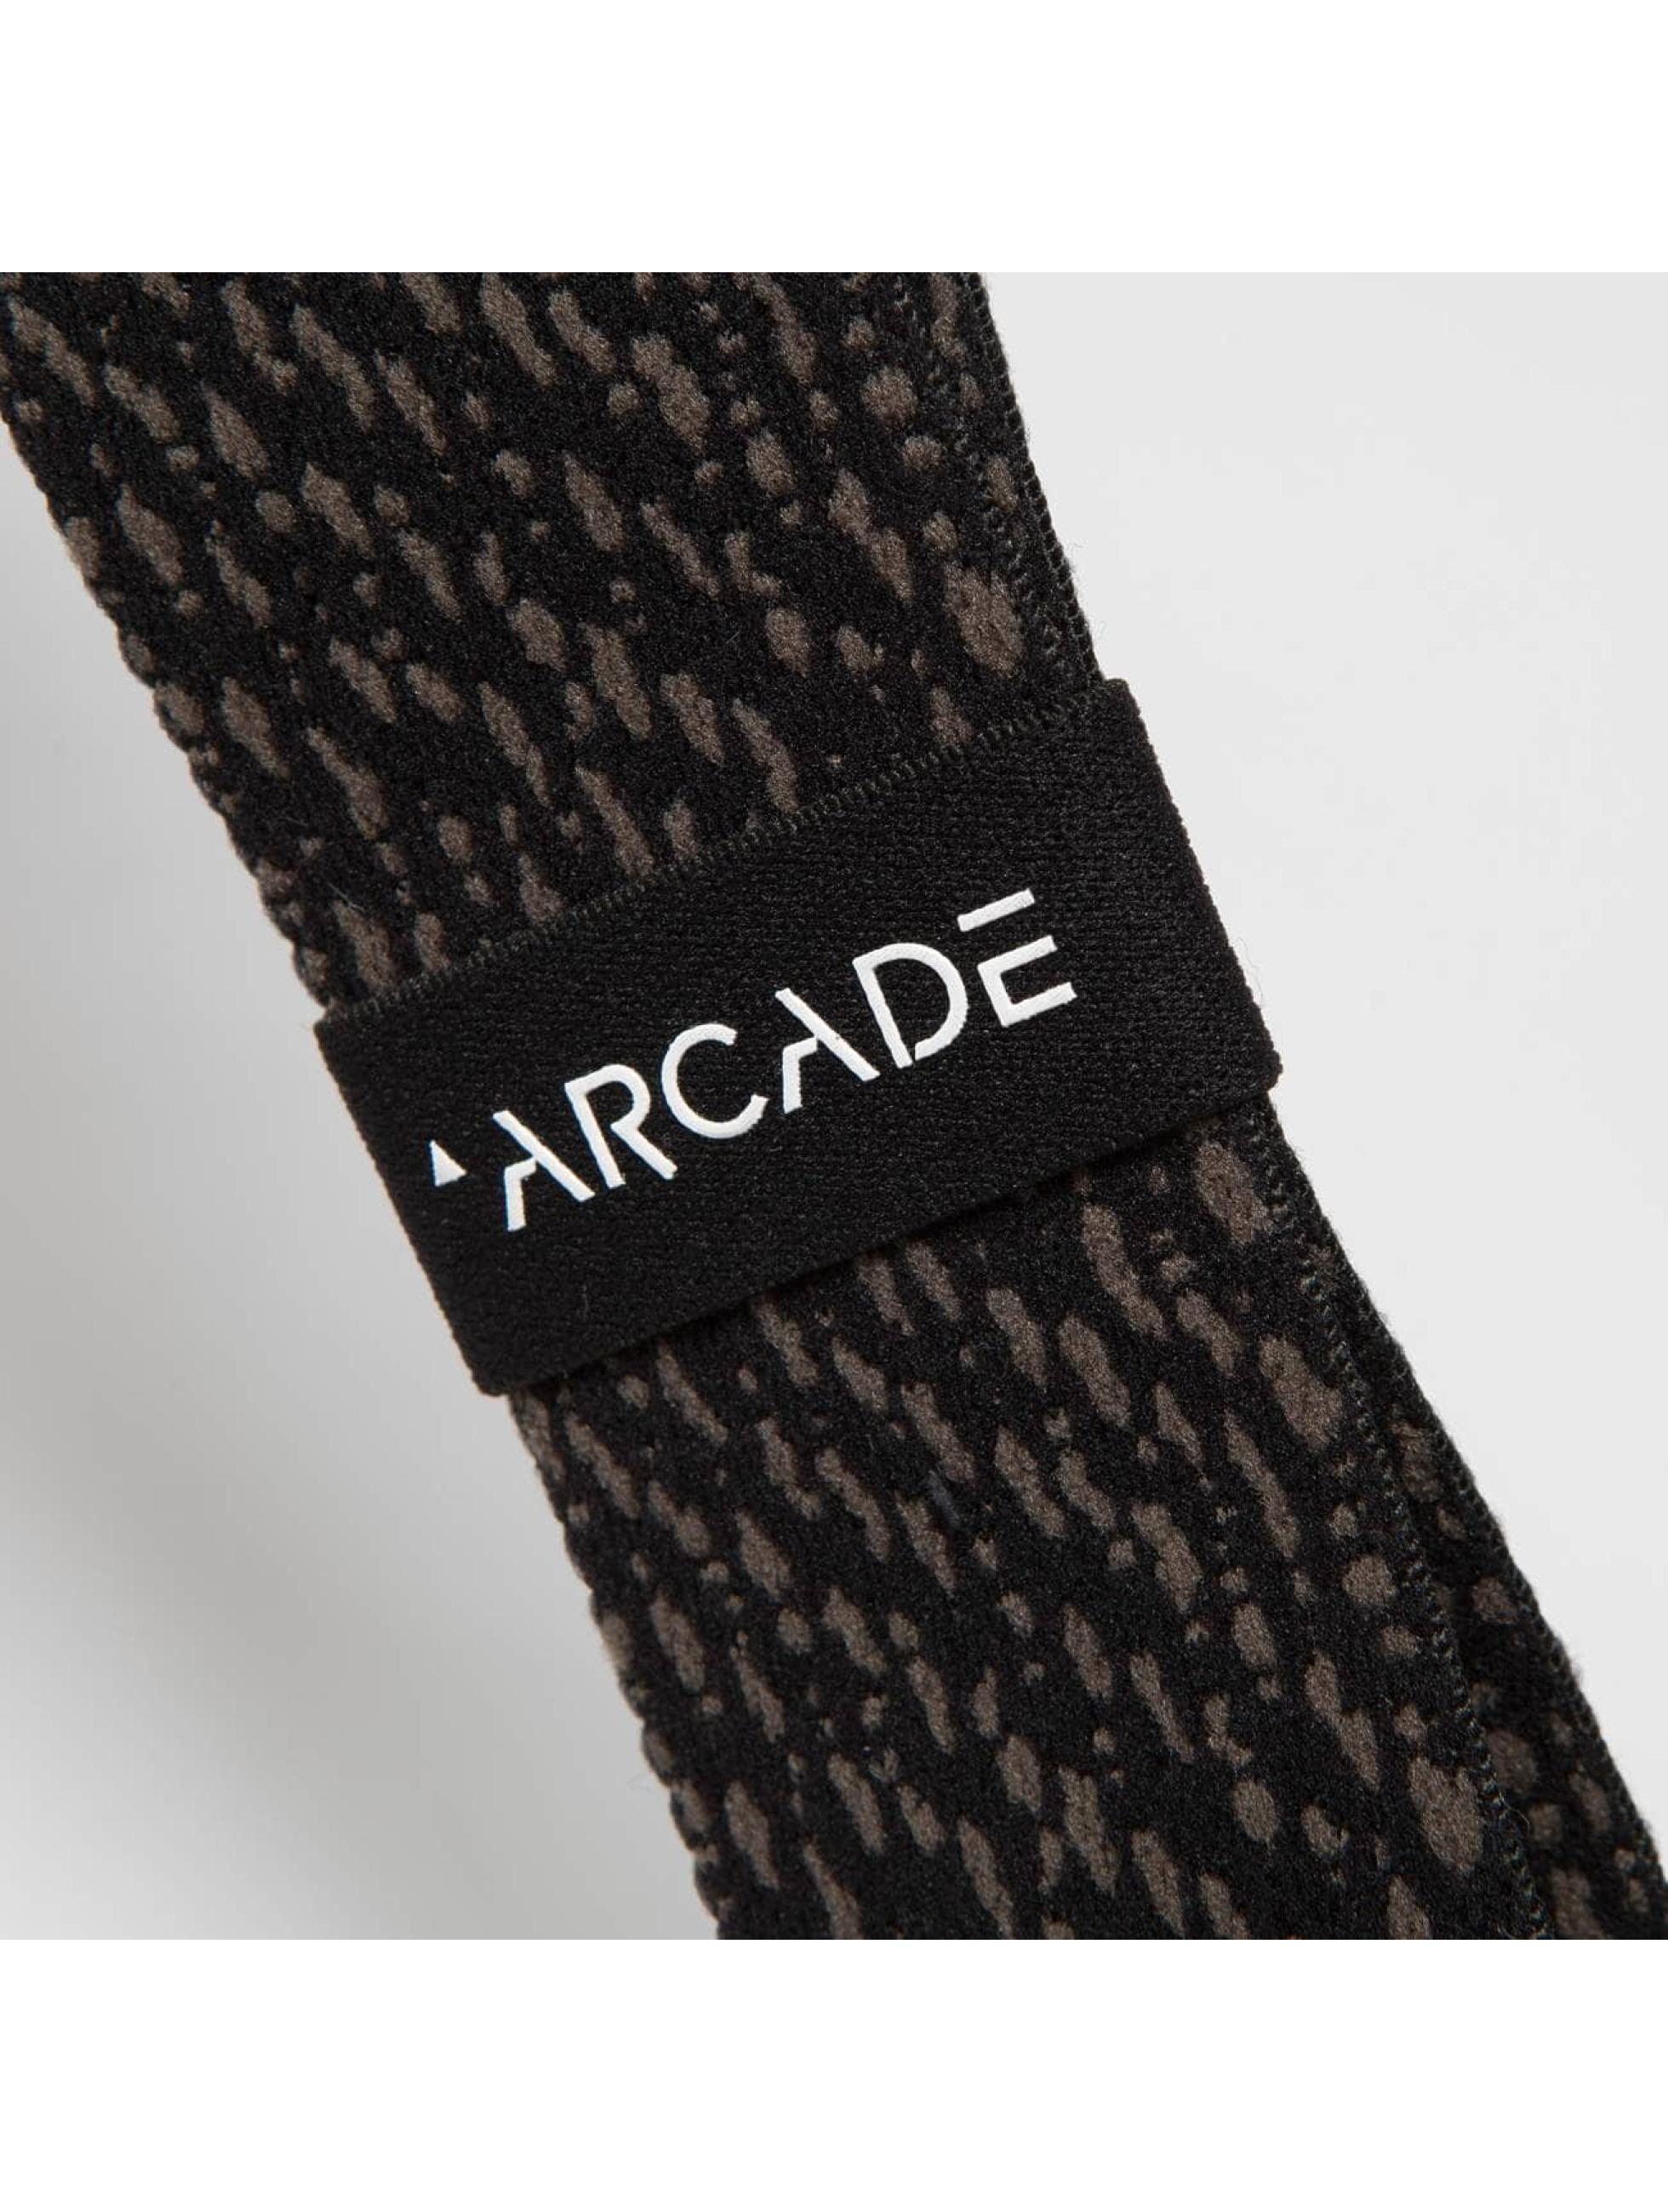 ARCADE Ceinture Performance Static noir